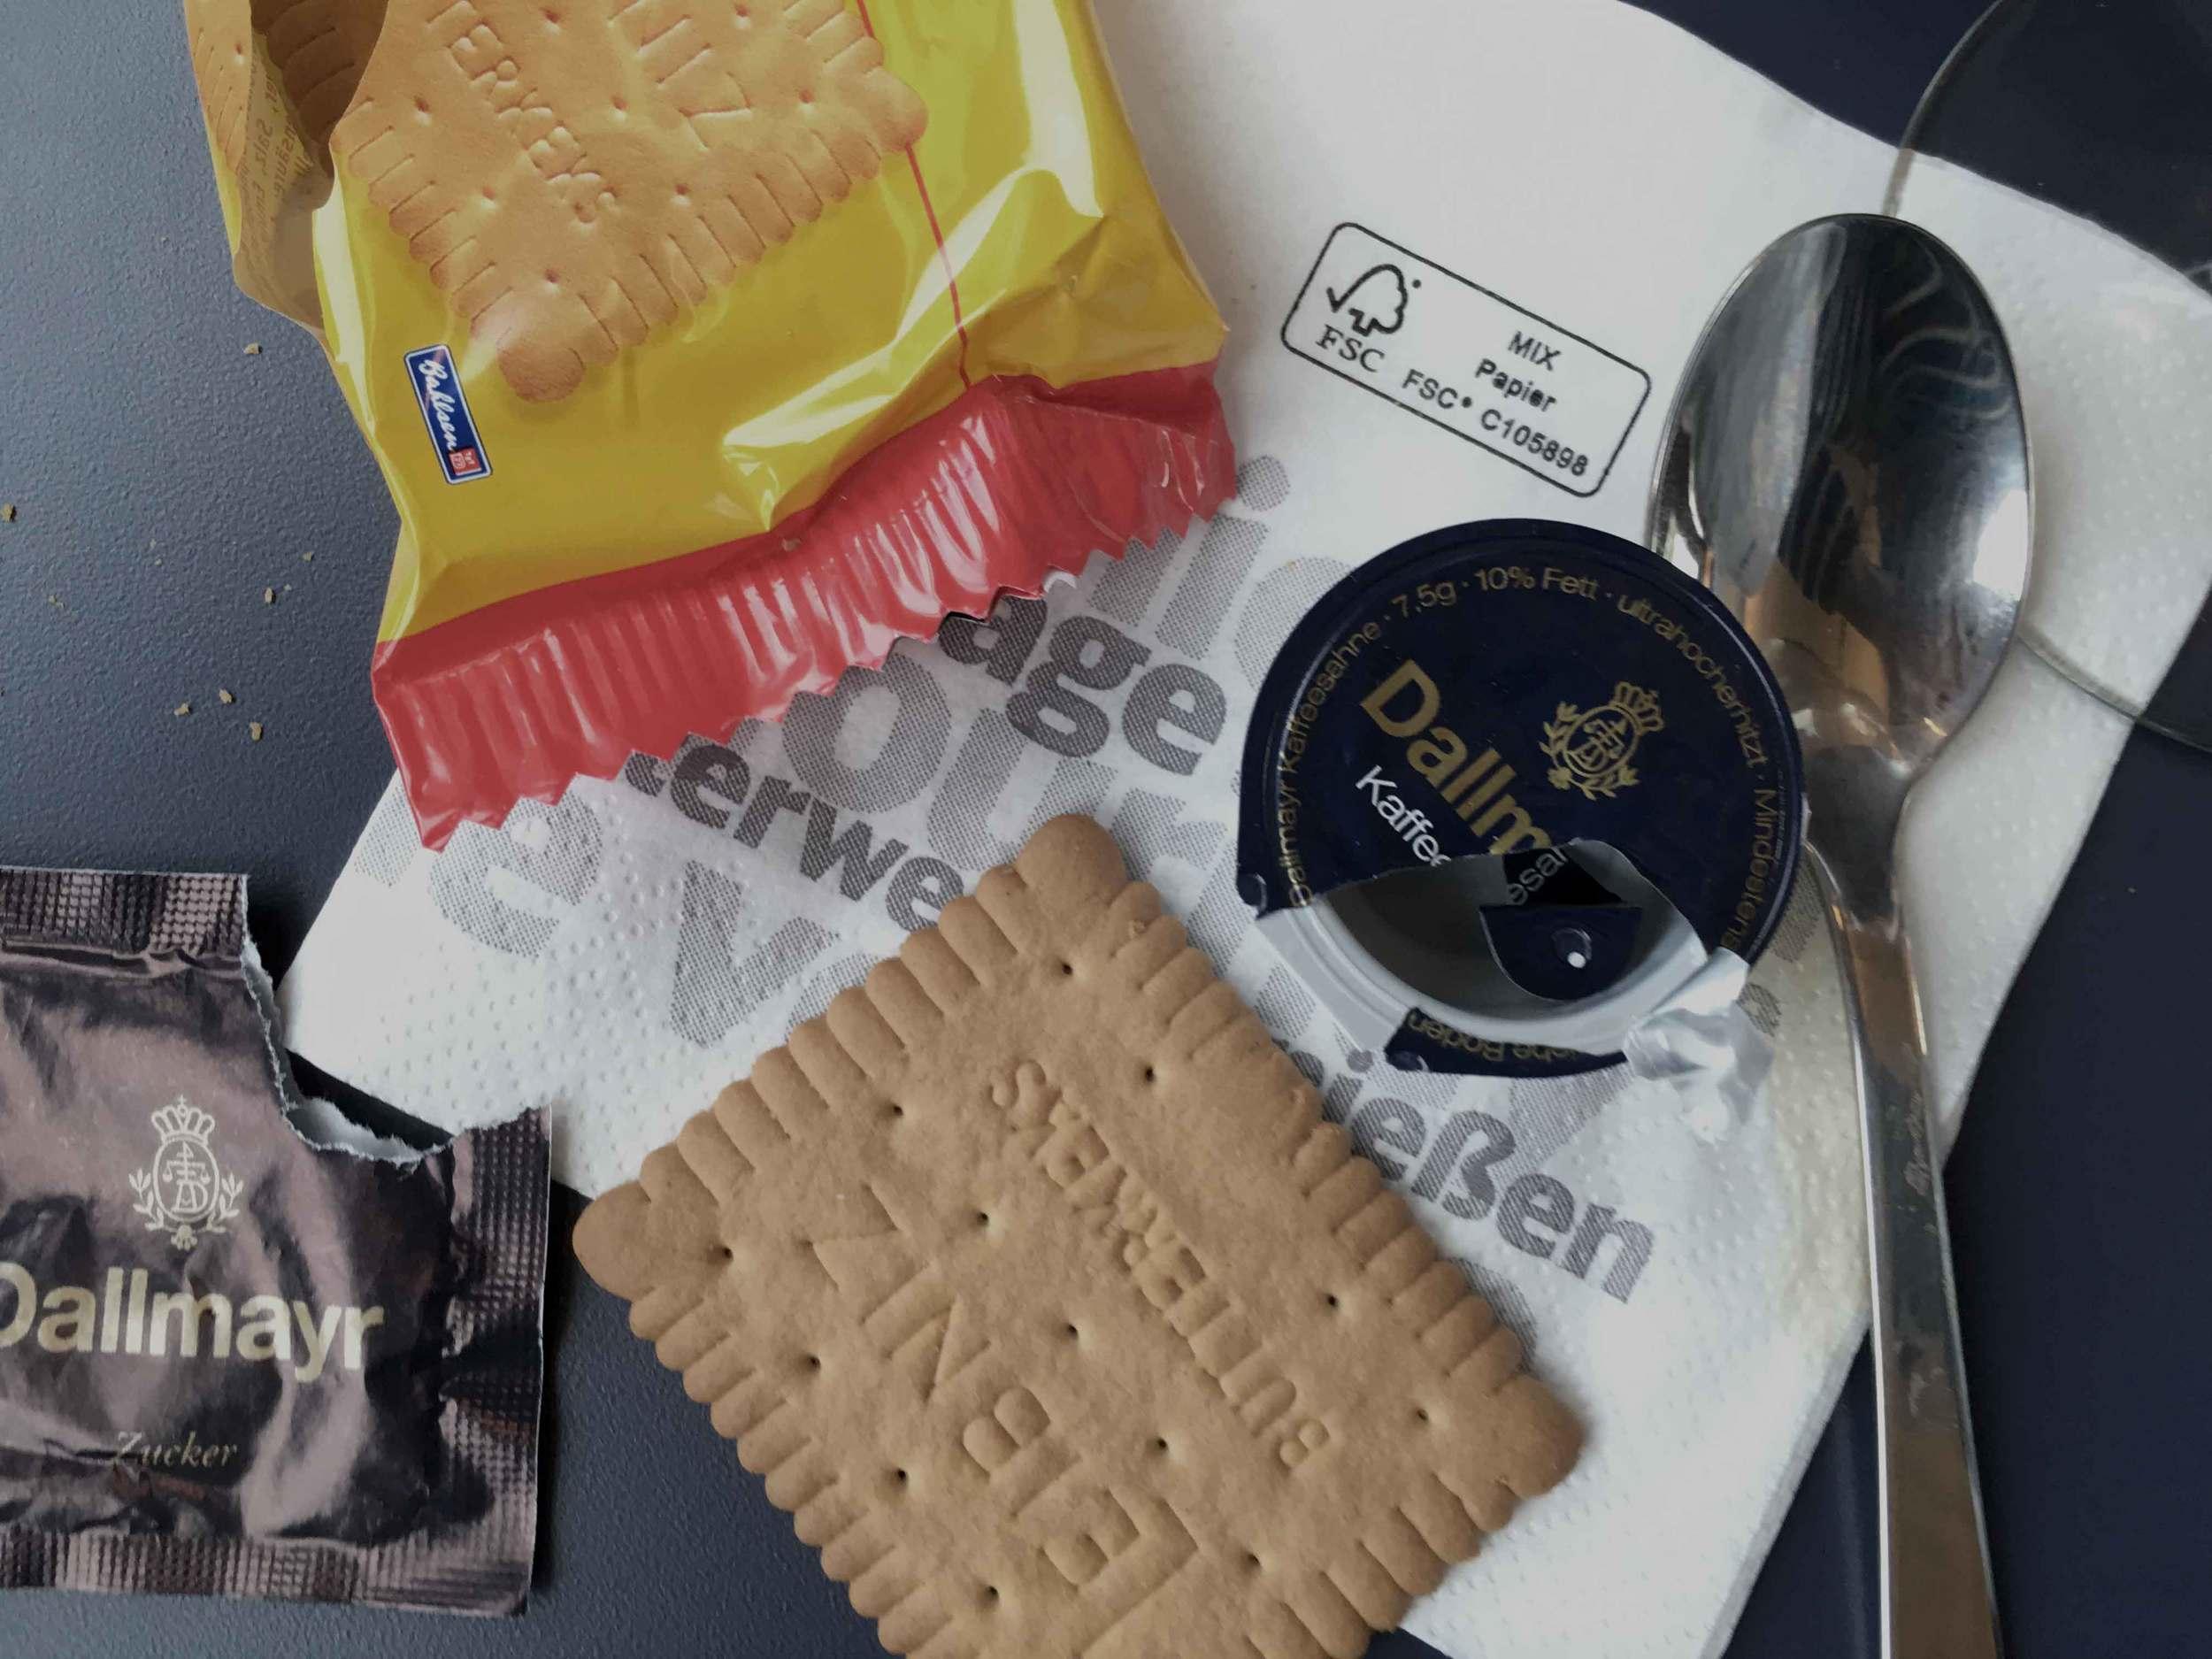 Leibniz cookies, snacks on board the German ICE train, Inter City Express, first class compartment, Deutsche Bahn, German rail. Image ©sourcingstyle.com